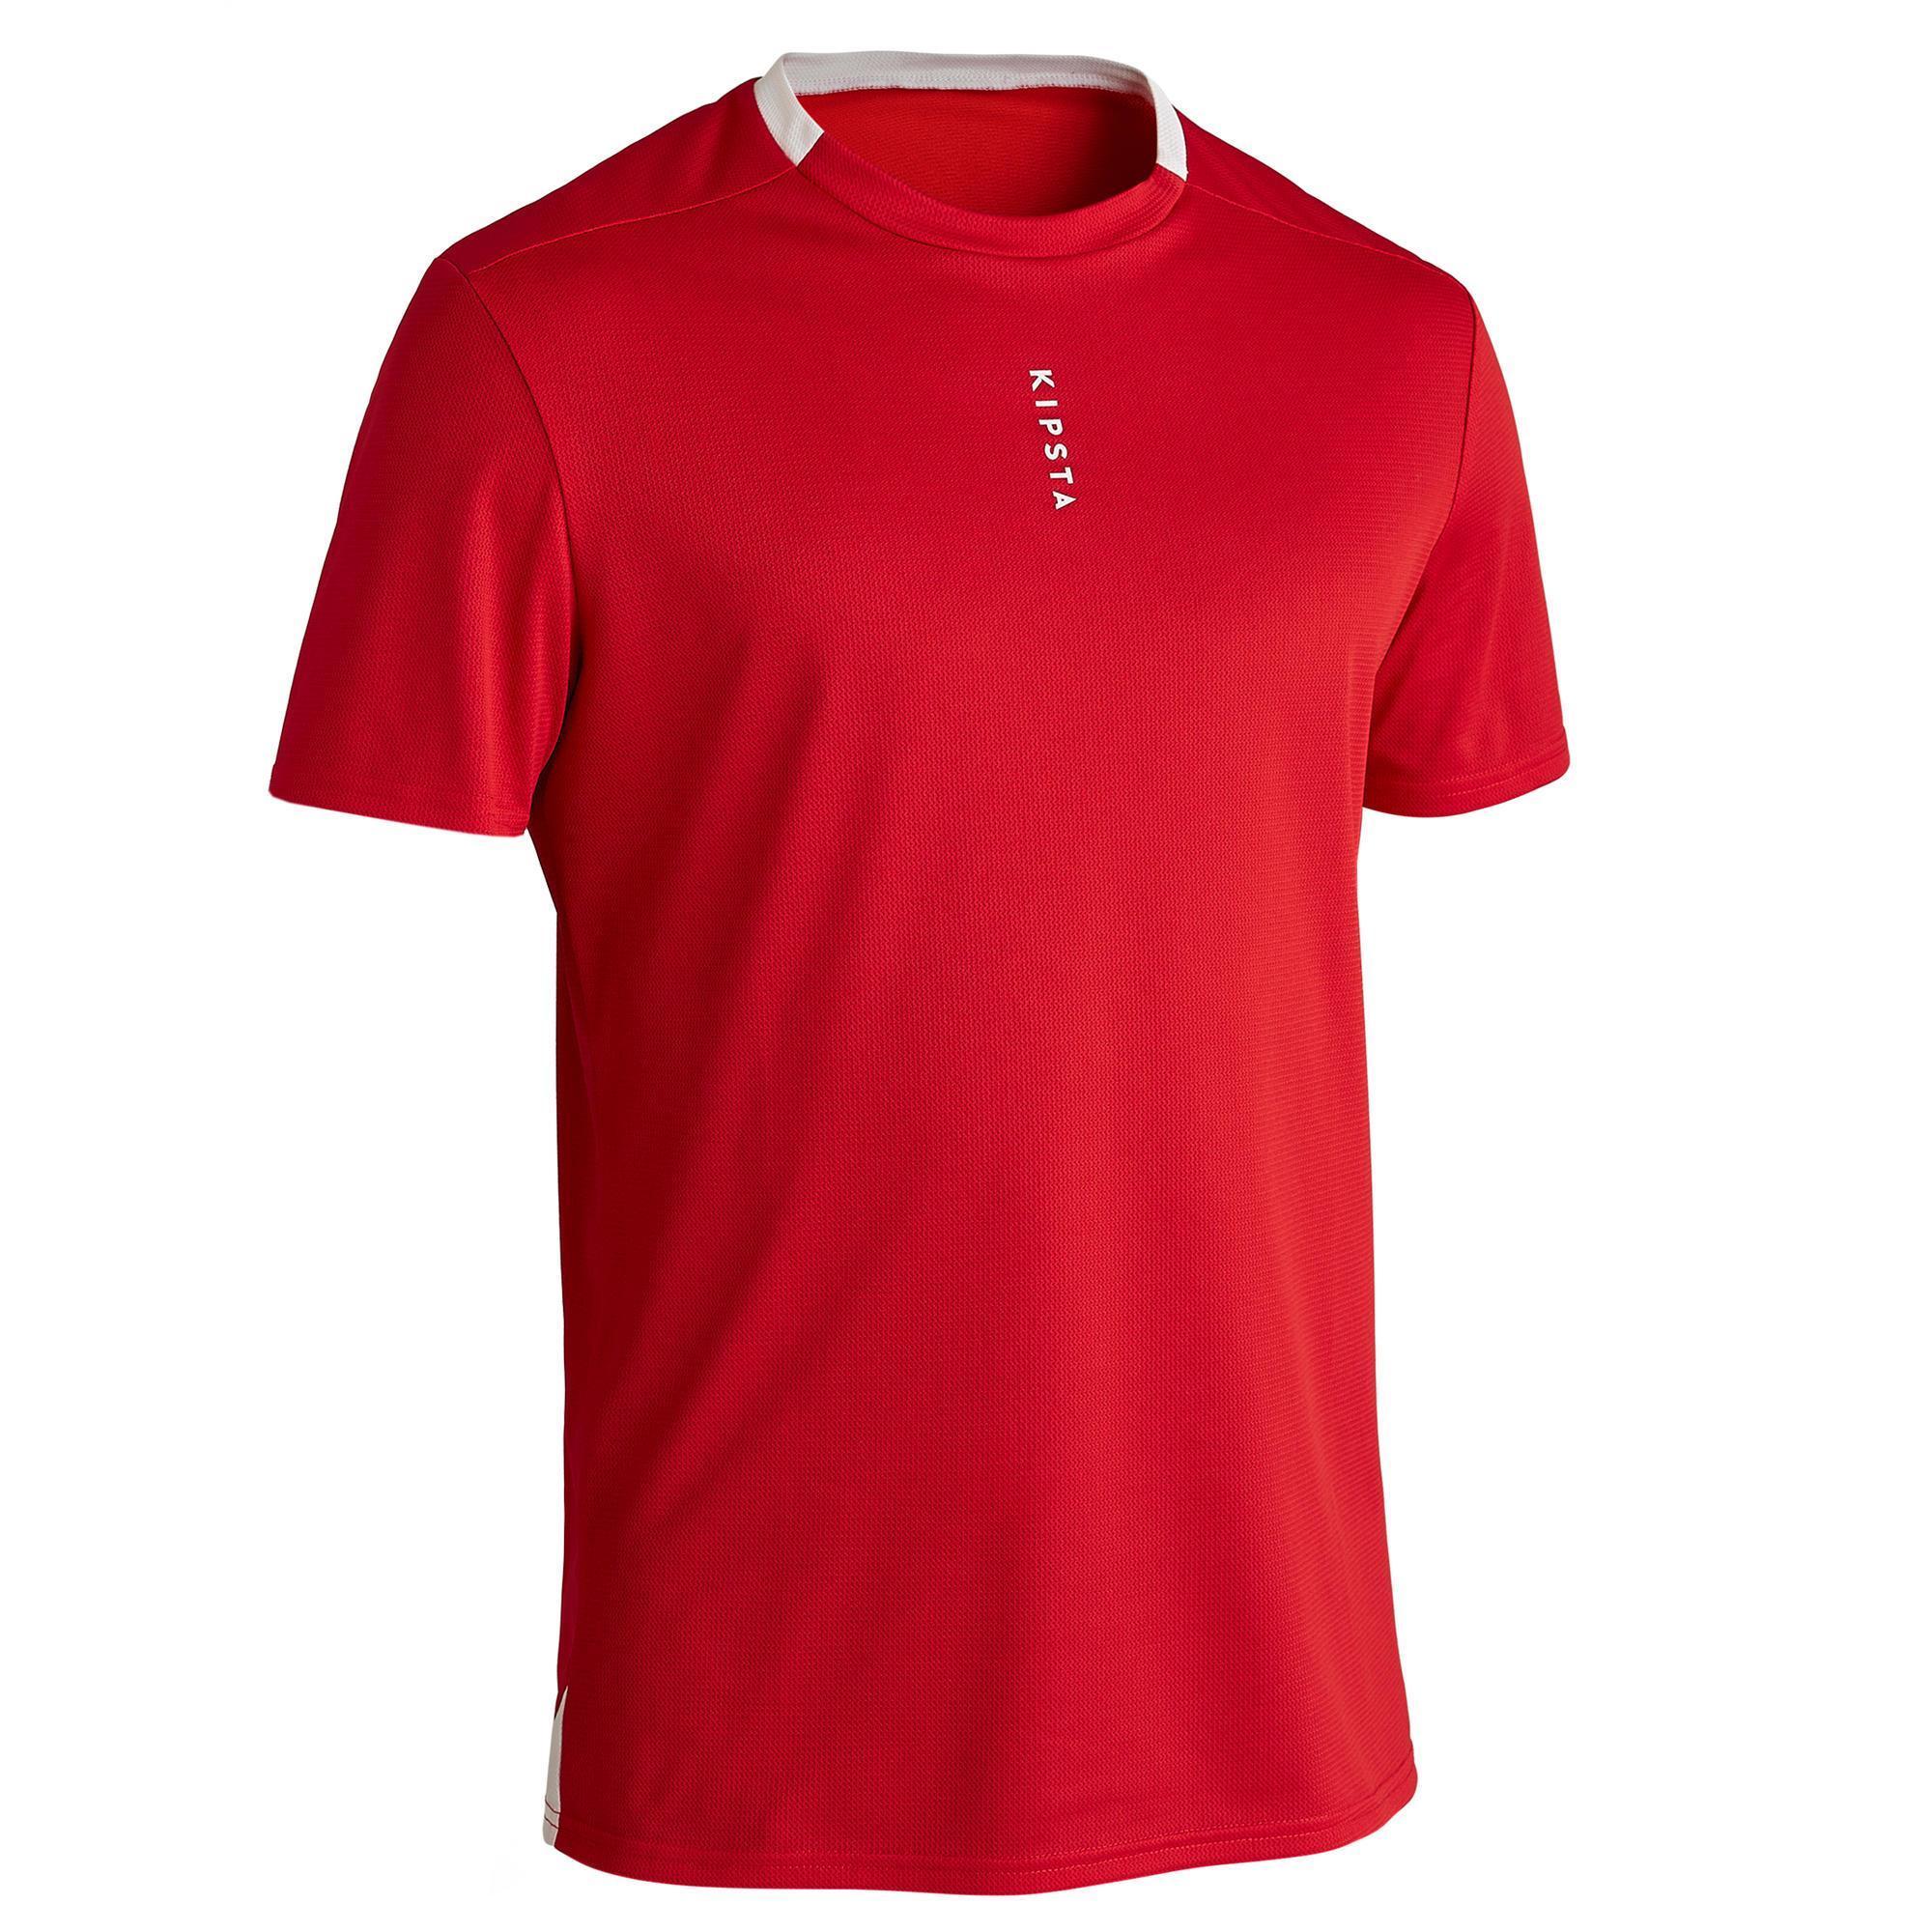 Fußballtrikot F100 Erwachsene | Sportbekleidung > Trikots | Kipsta